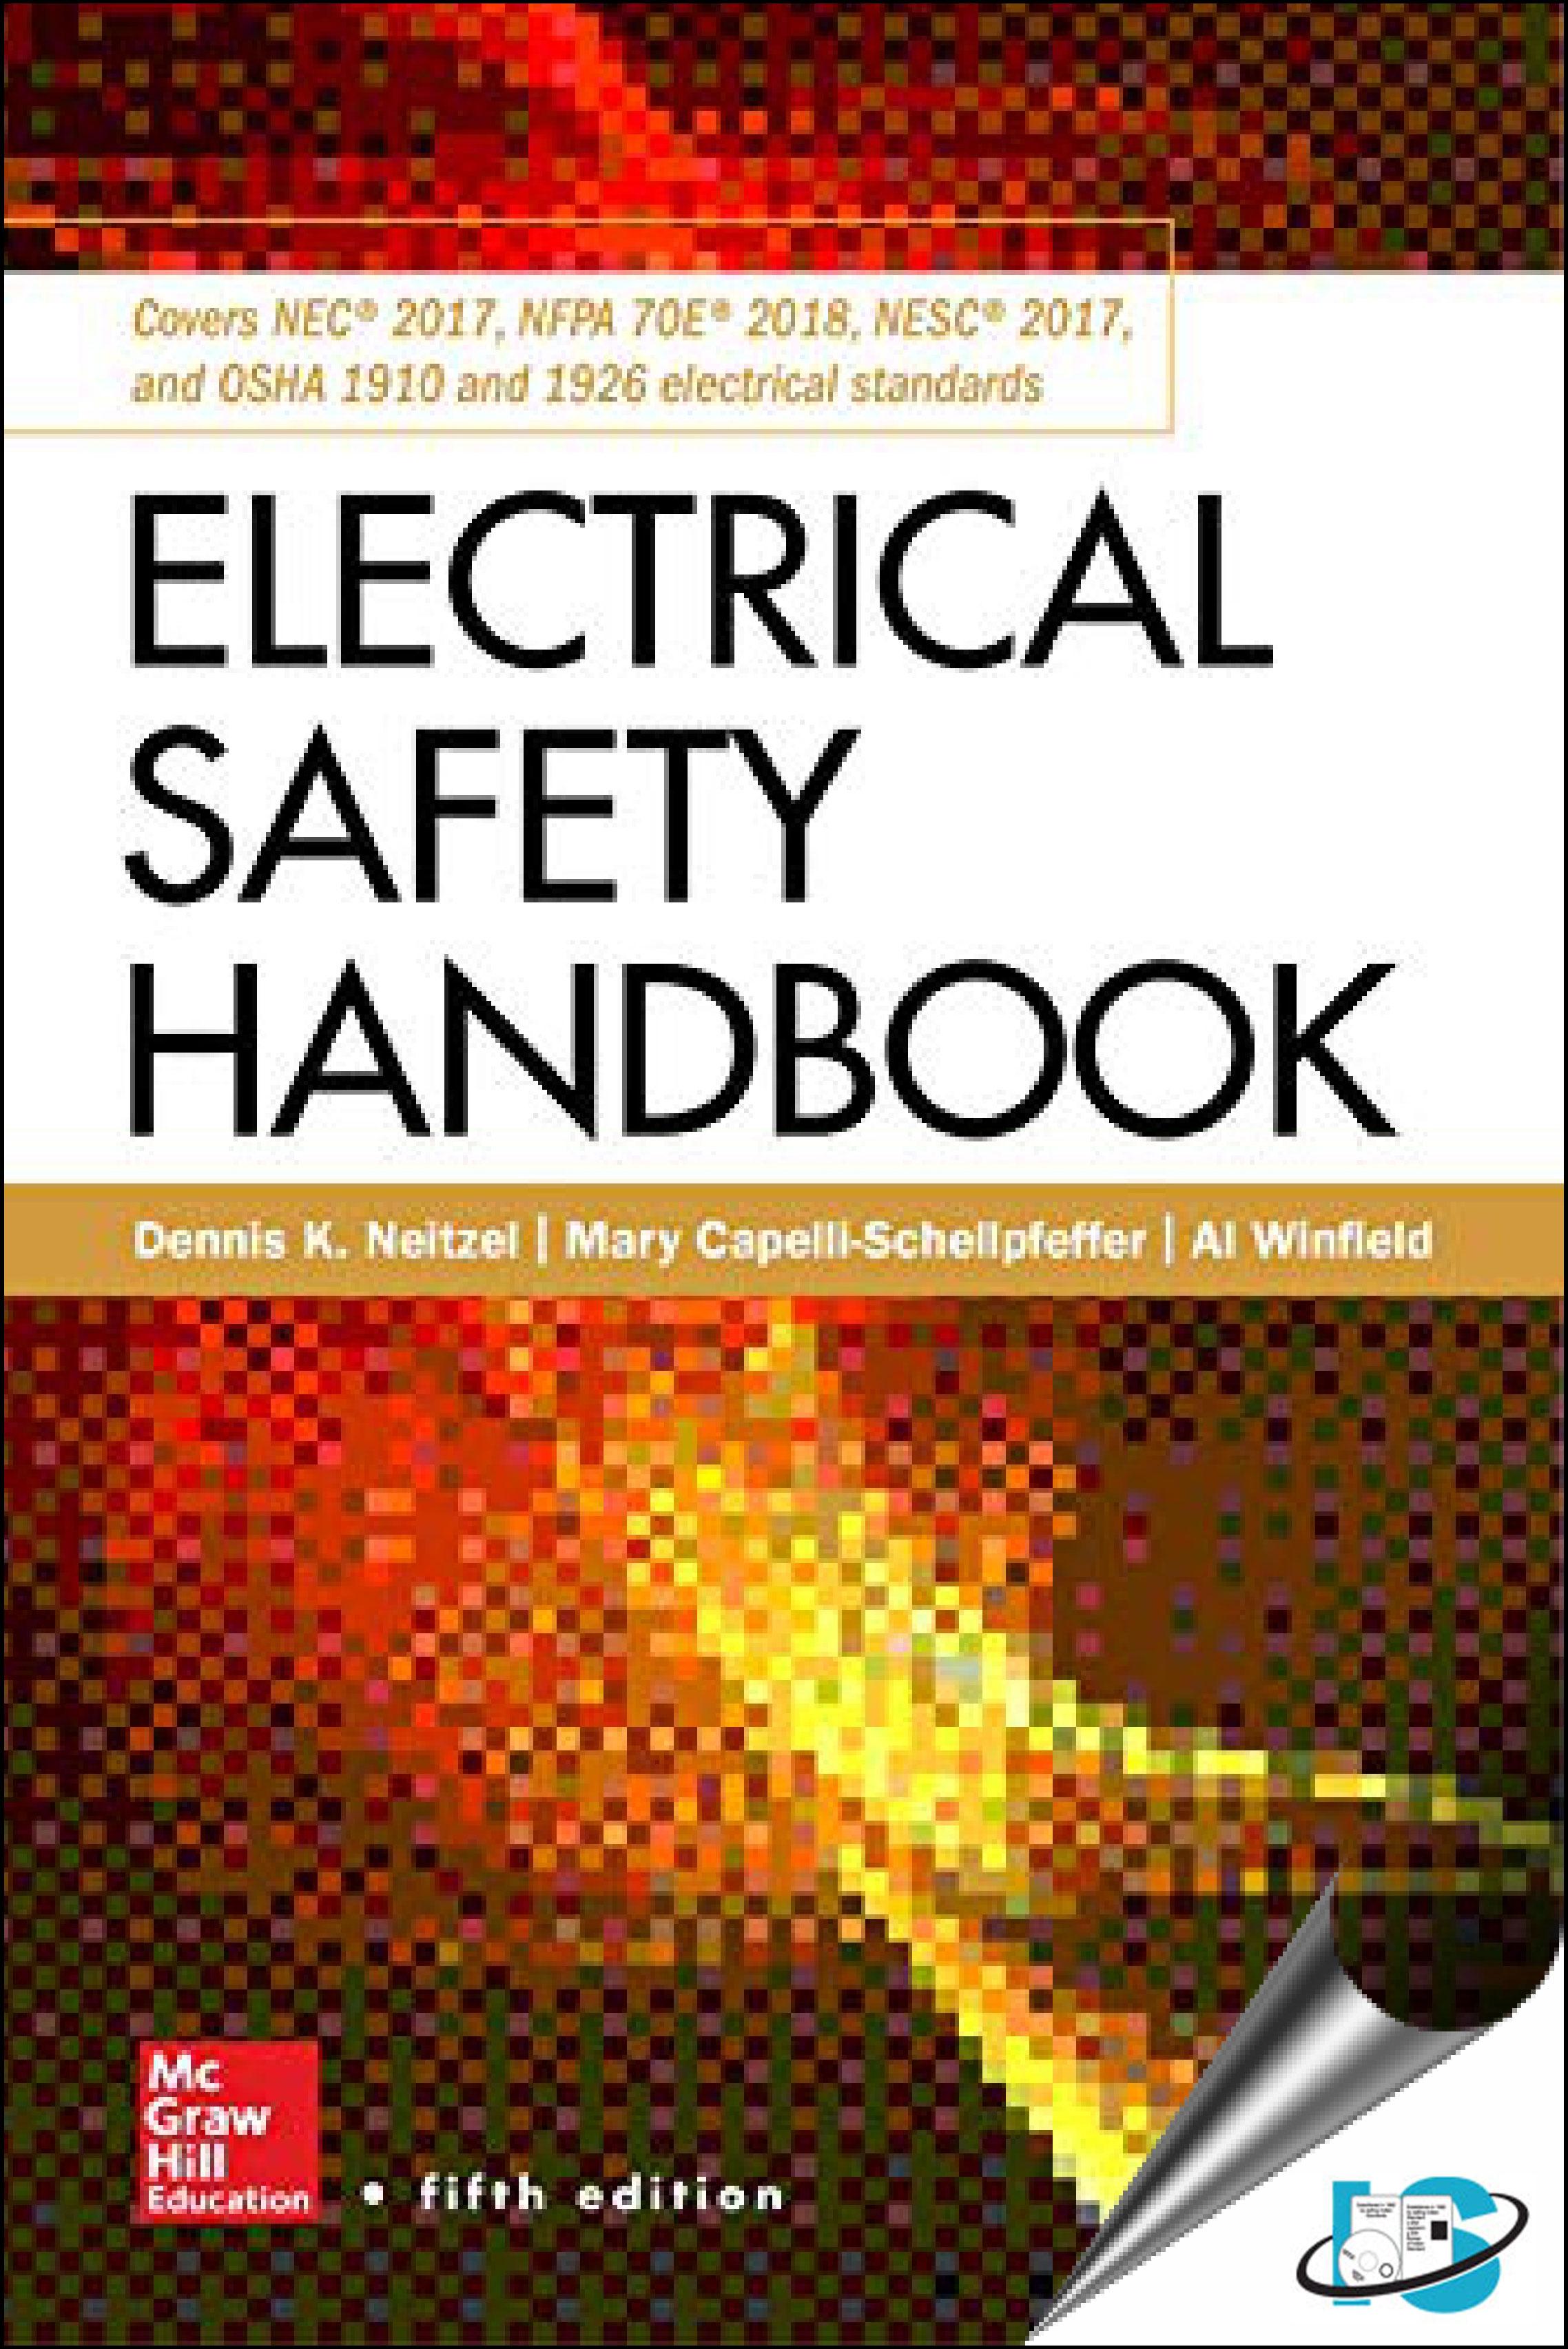 Electrical Safety Handbook, 5th Edition, Al Winfield, Dennis